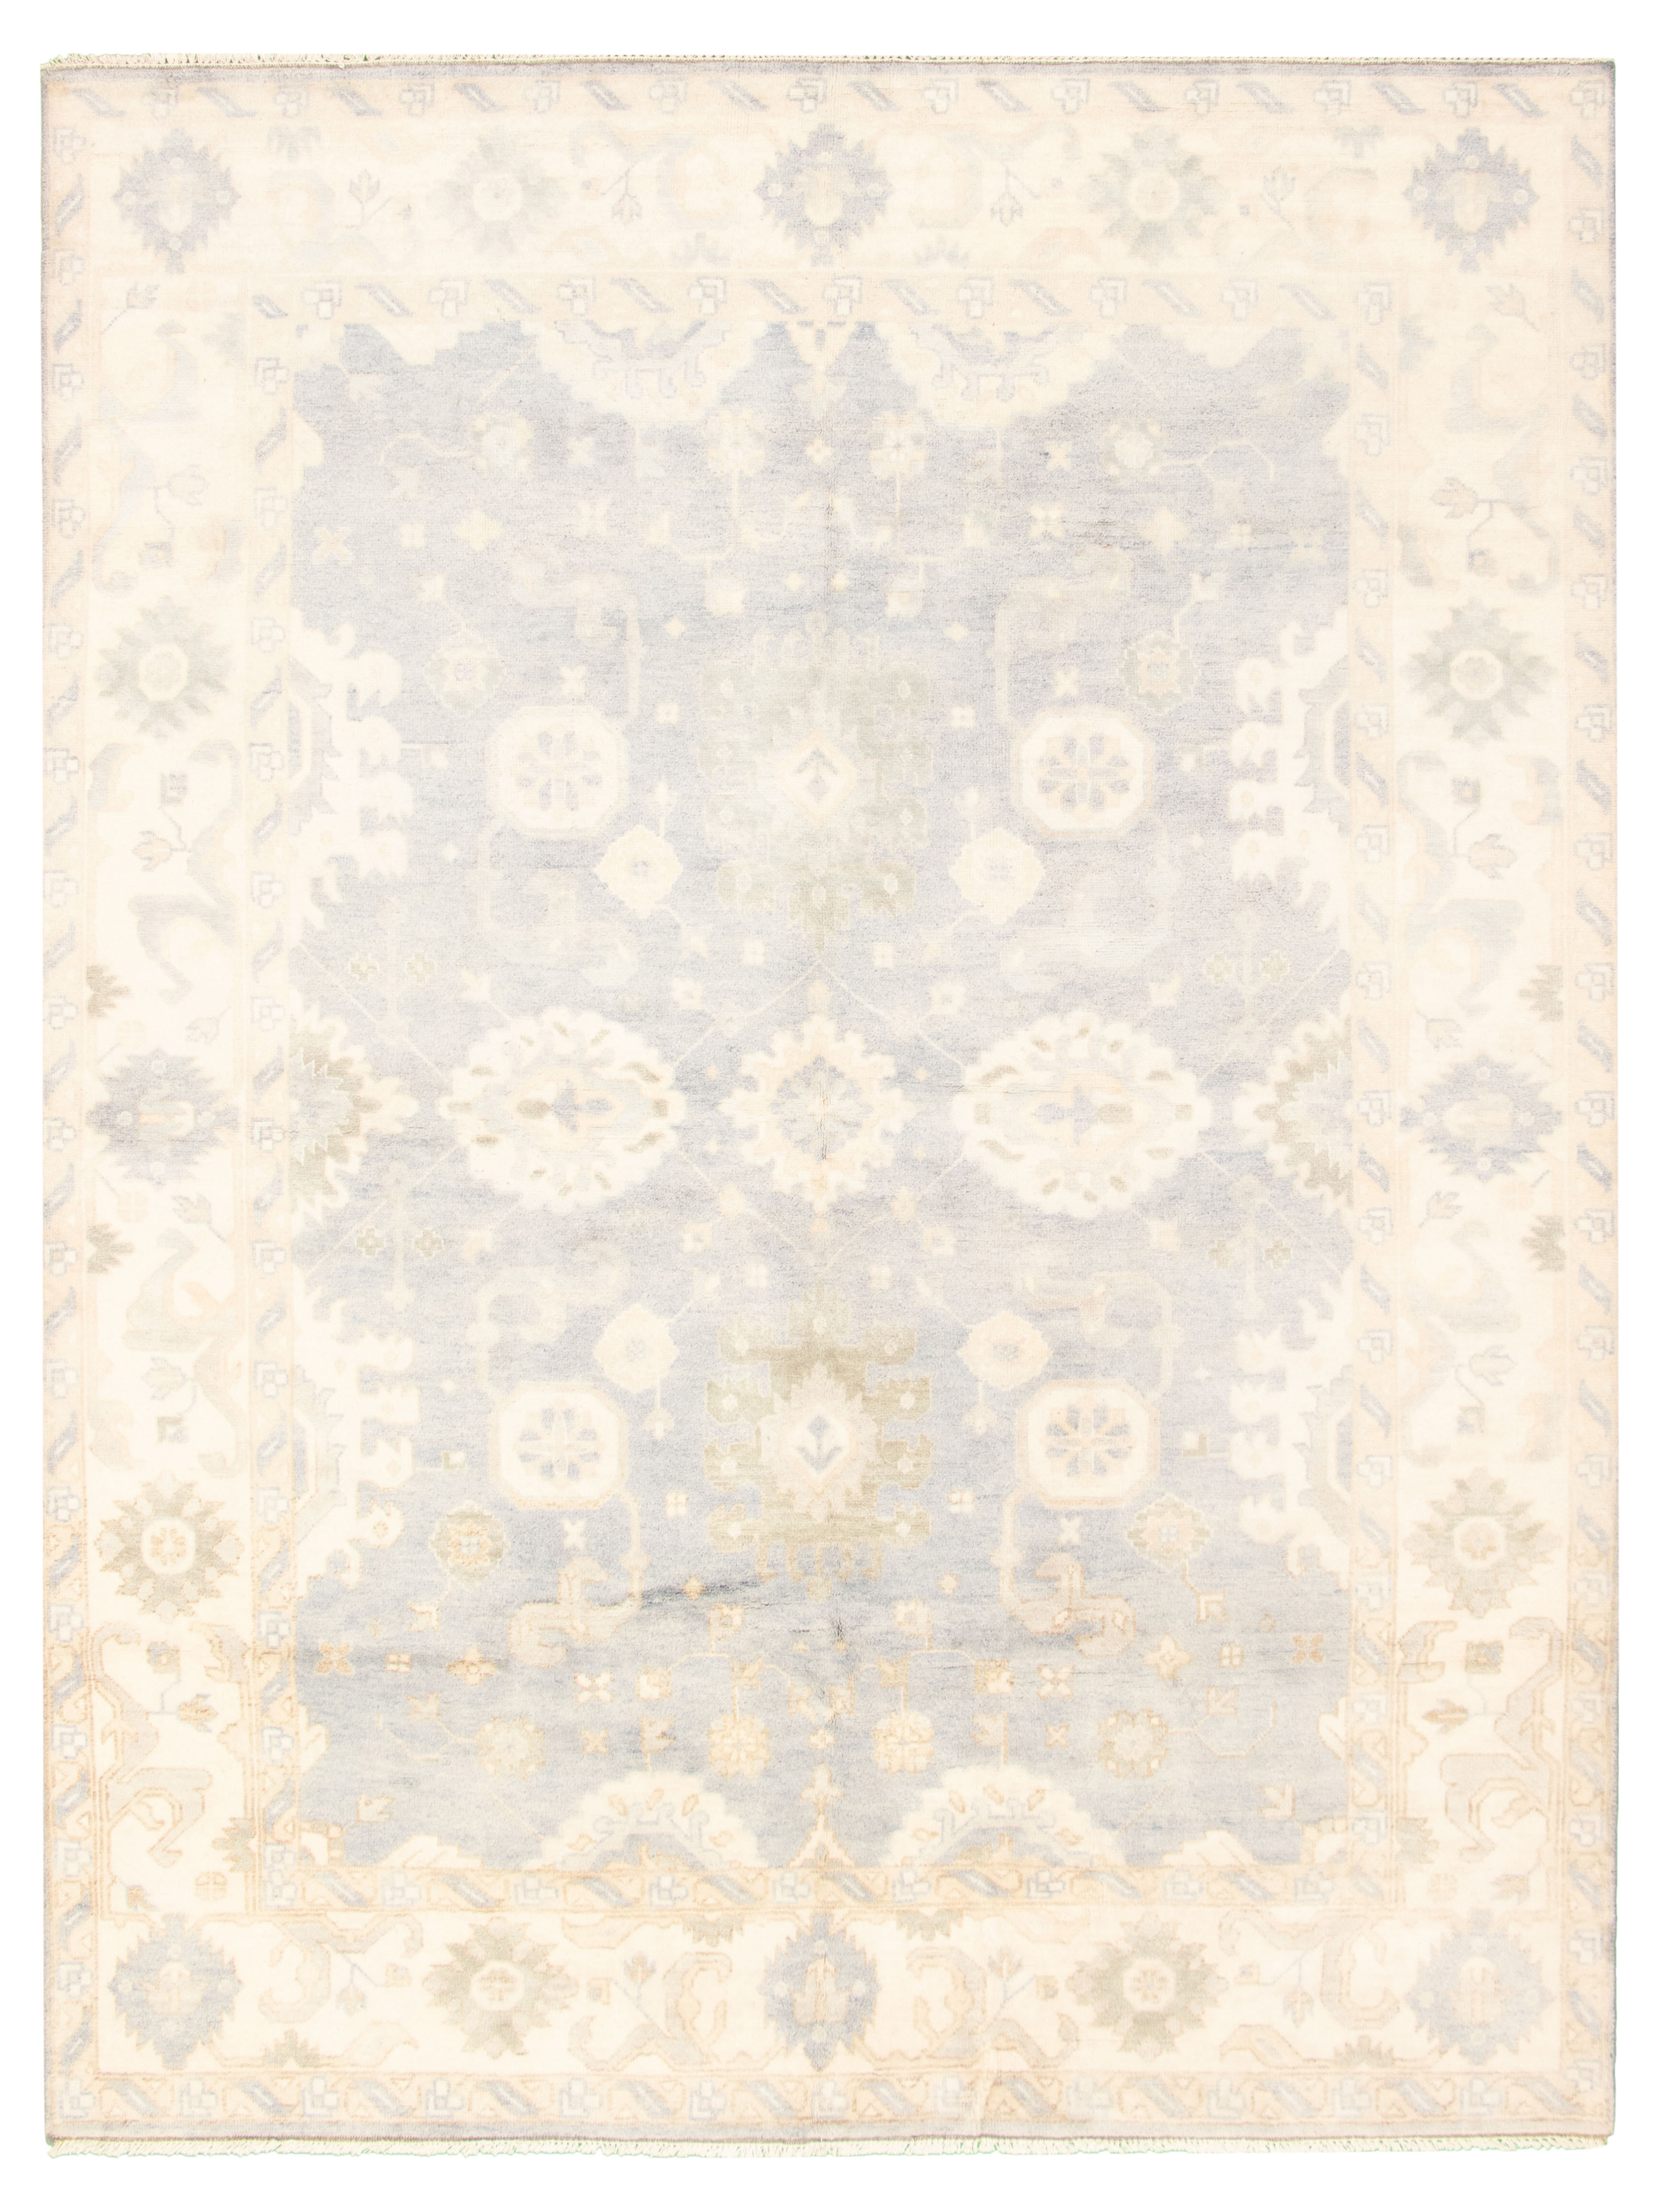 "Hand-knotted Royal Ushak Light Denim Blue Wool Rug 9'0"" x 11'8"" Size: 9'0"" x 11'8"""